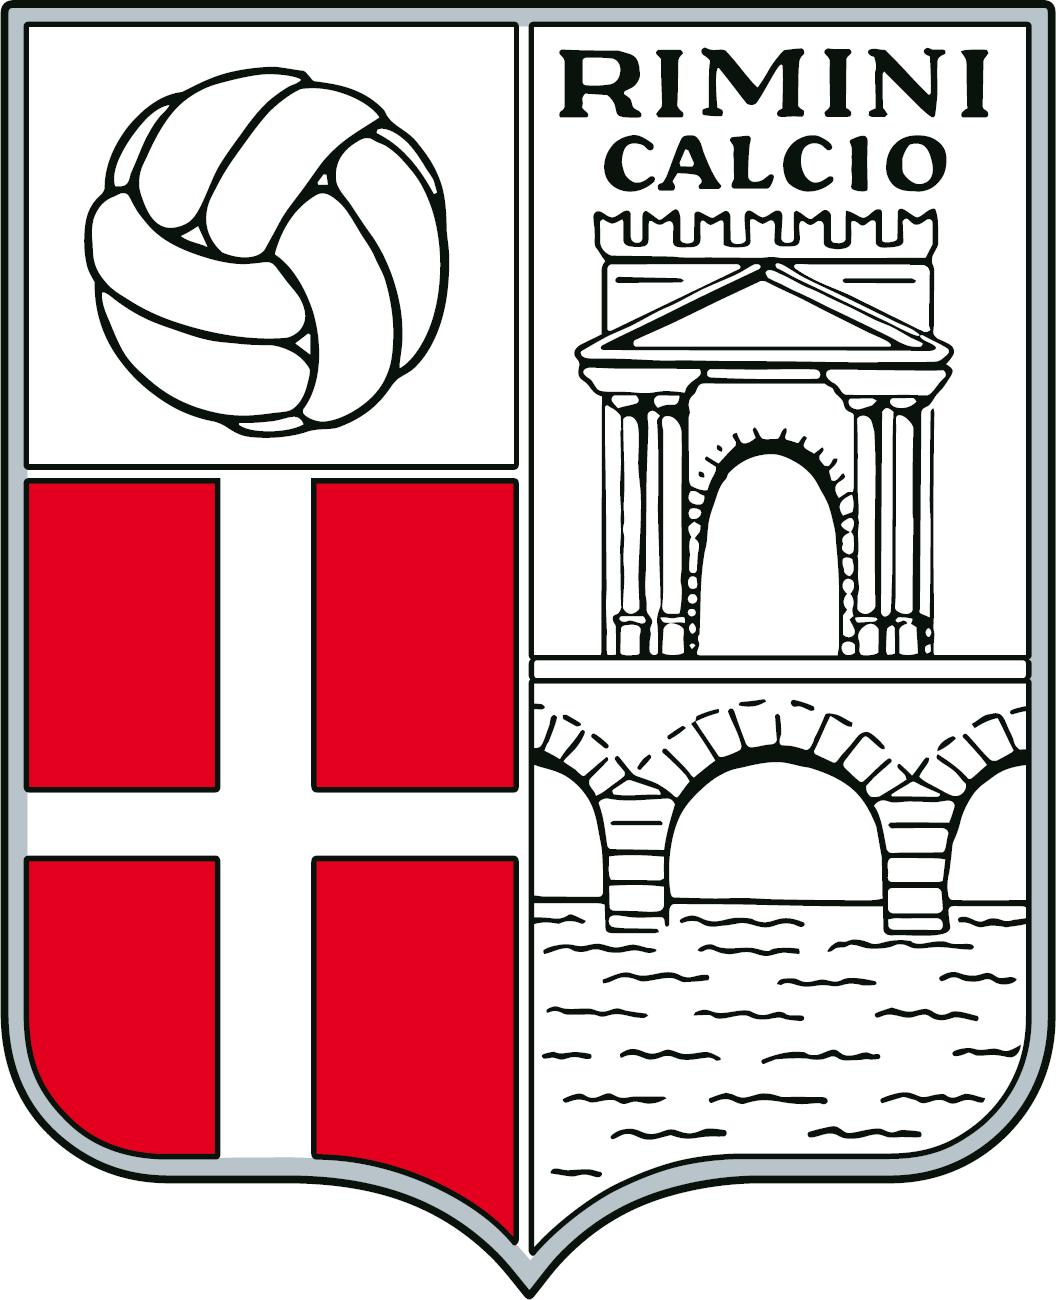 rimini football club 1912 � wikipedia